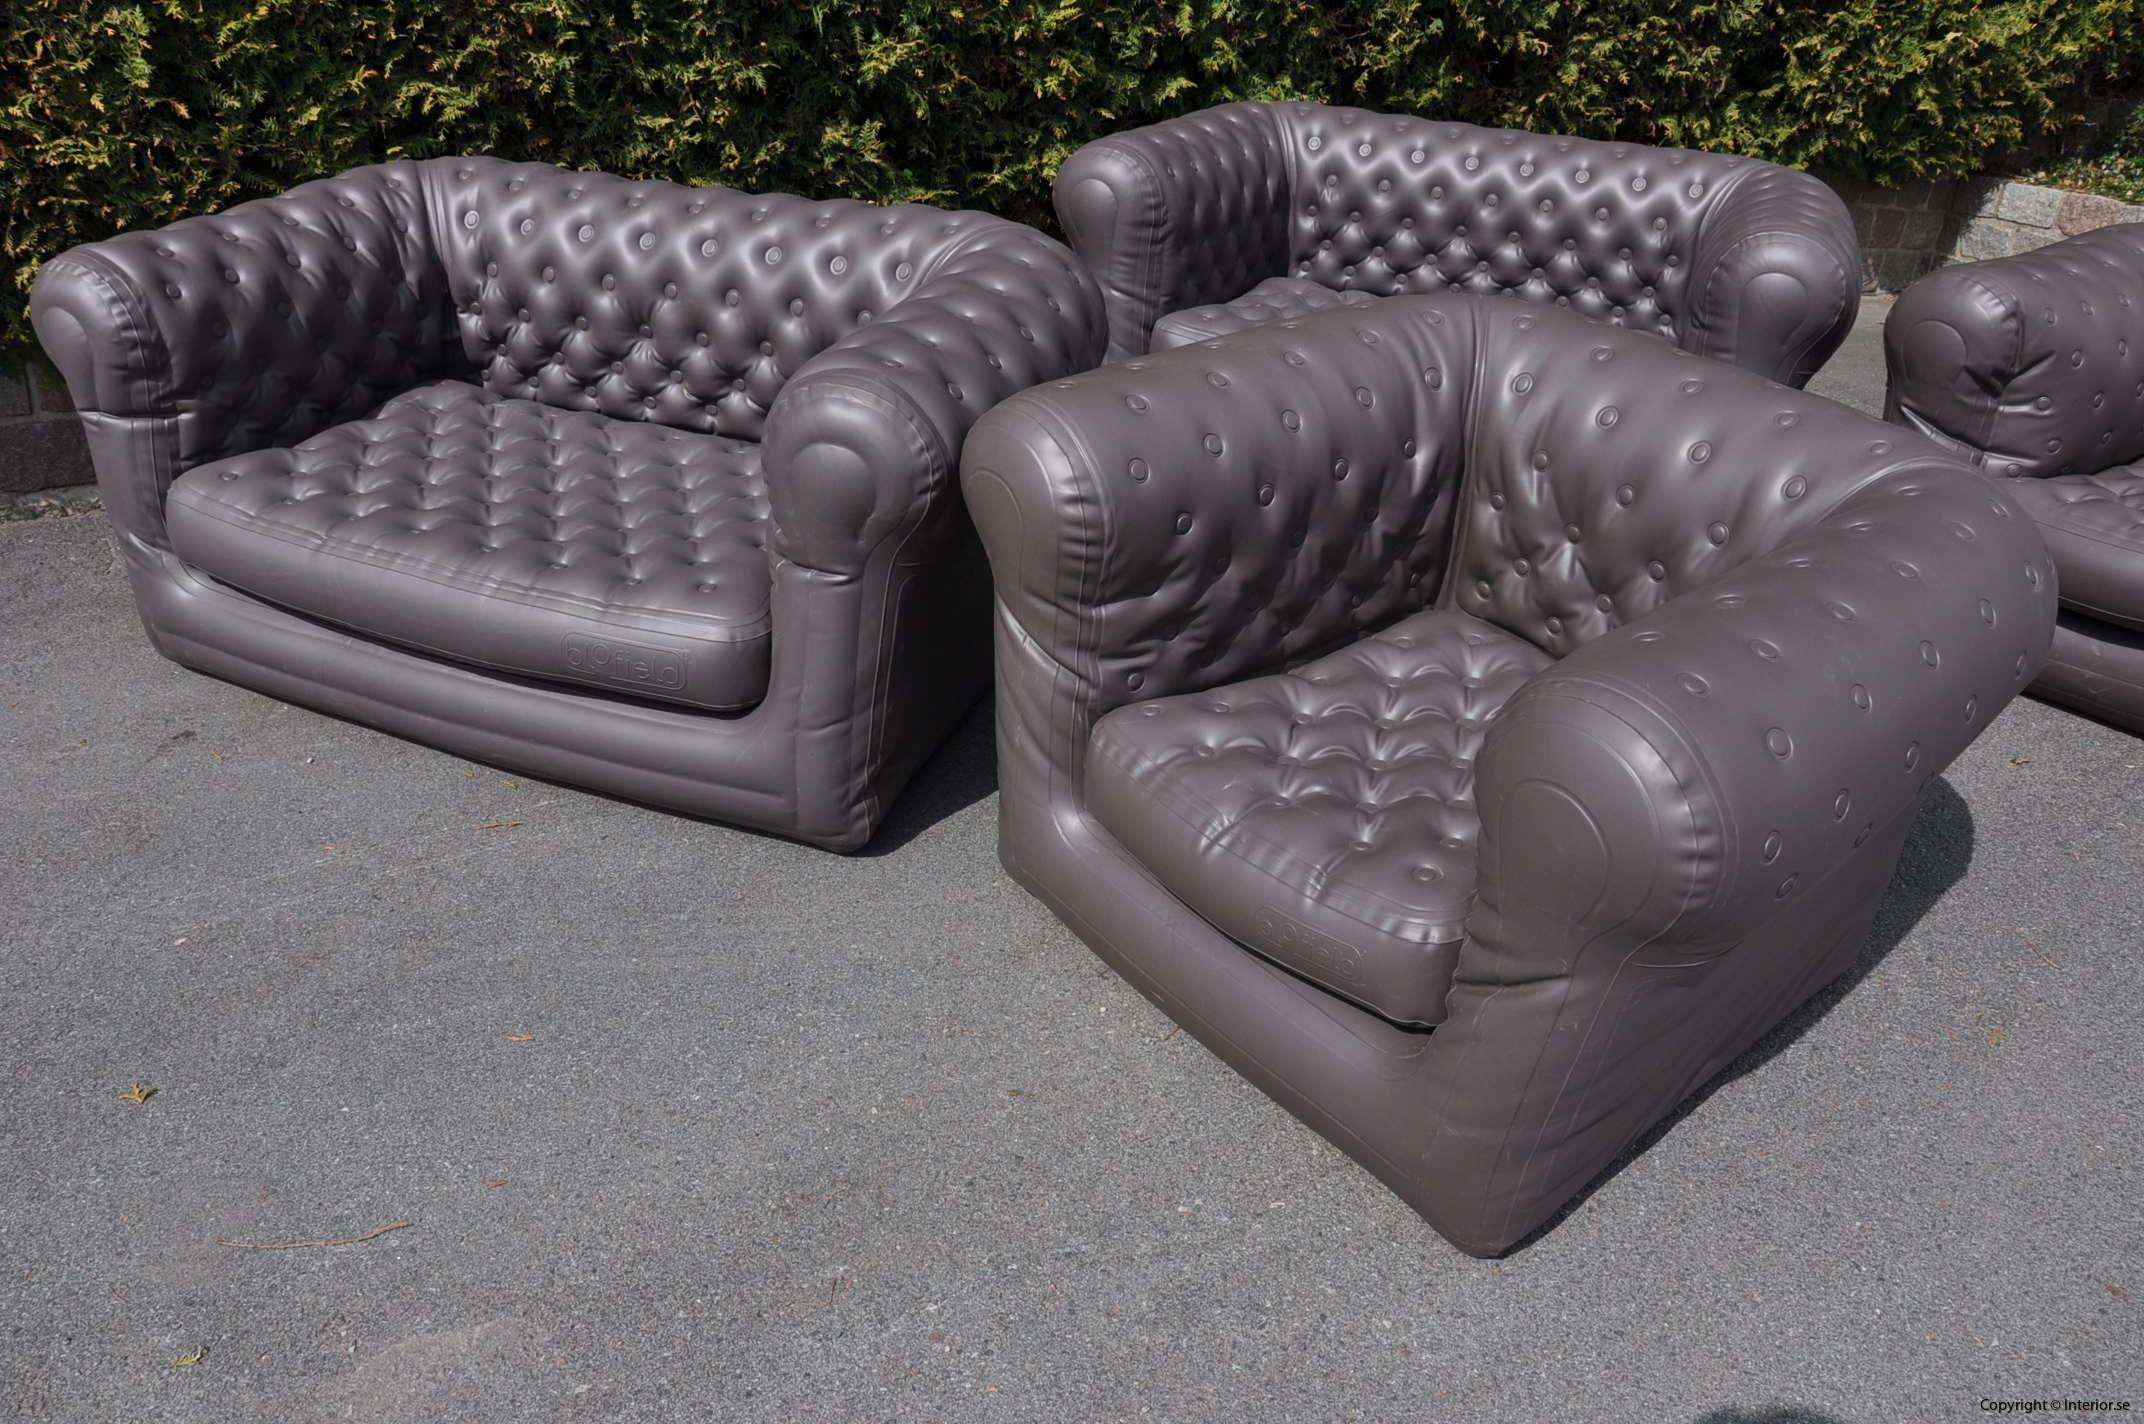 hyra uppblåsbara möbler hyr möbler event stockholm blofield furniture event sweden (7)